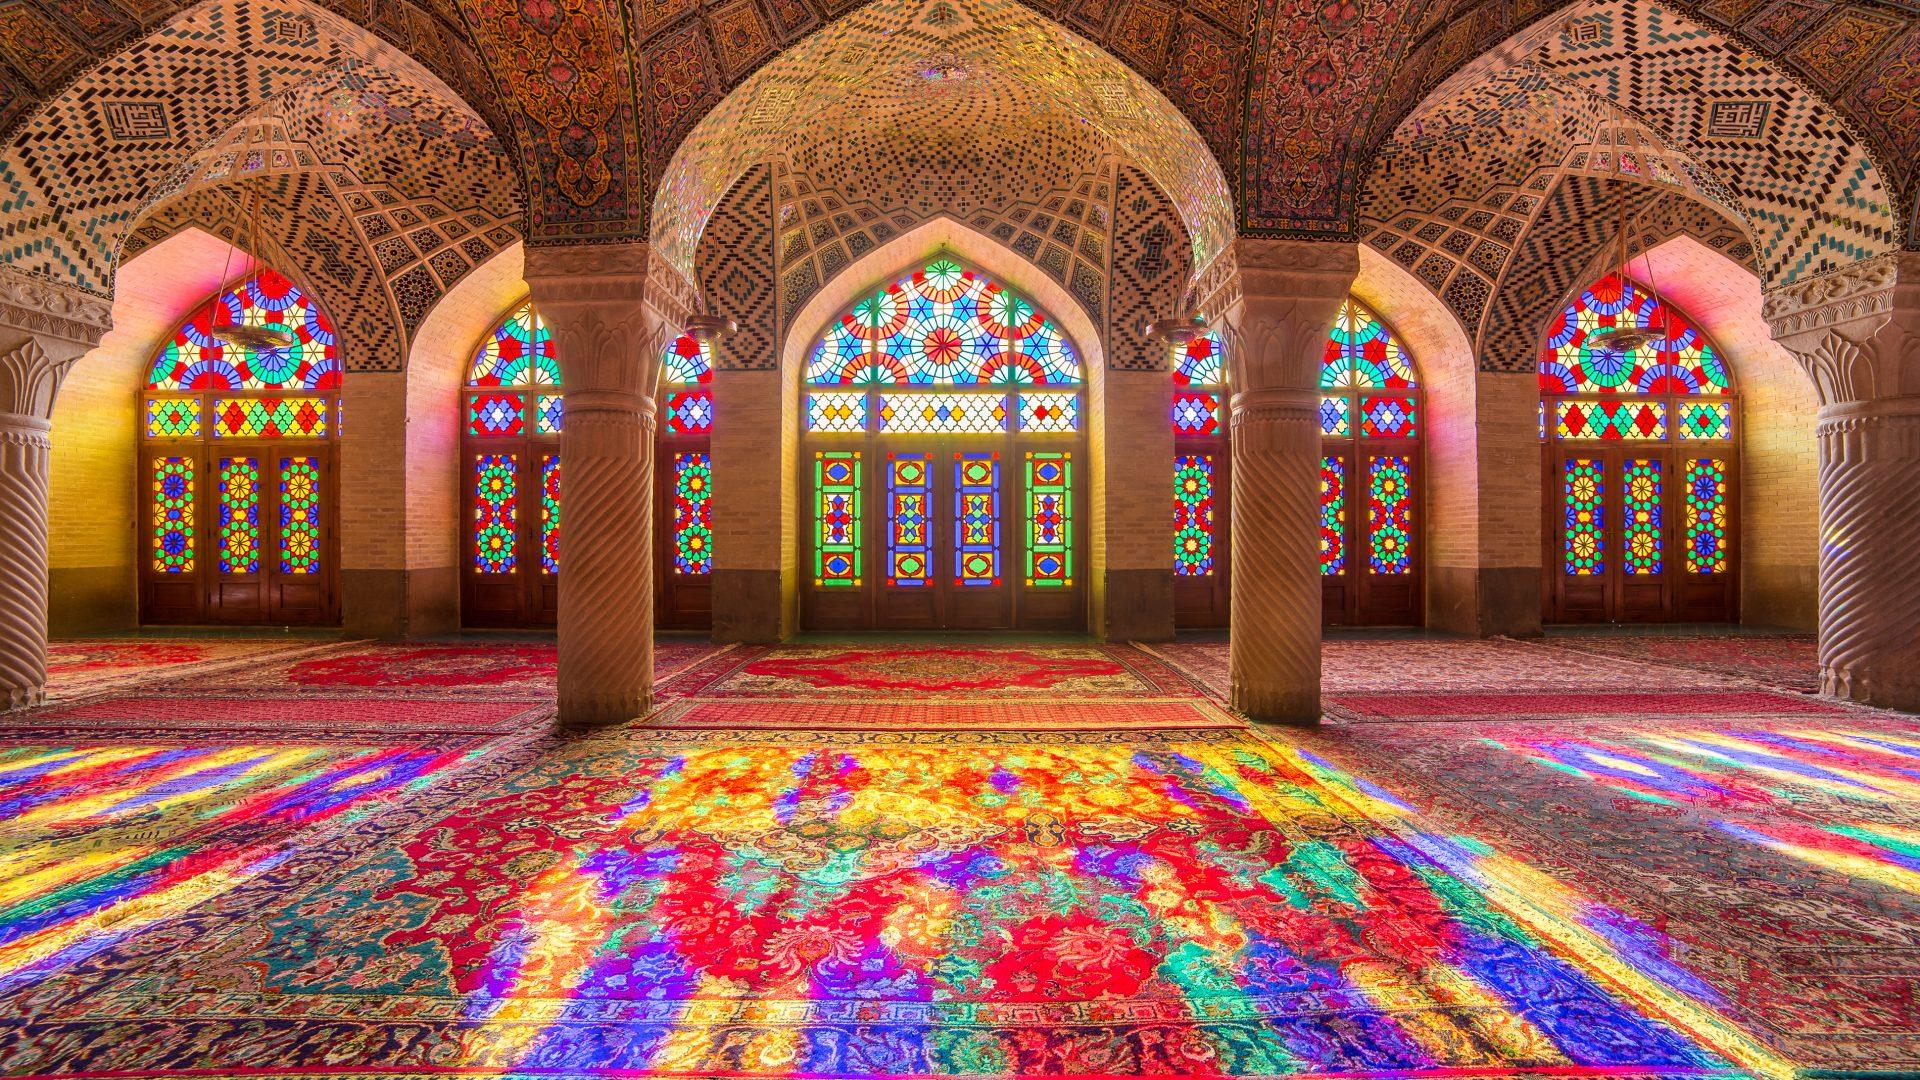 Nasir Al-Mulk Mosque in Shiraz, Iran, also known as Pink Mosque